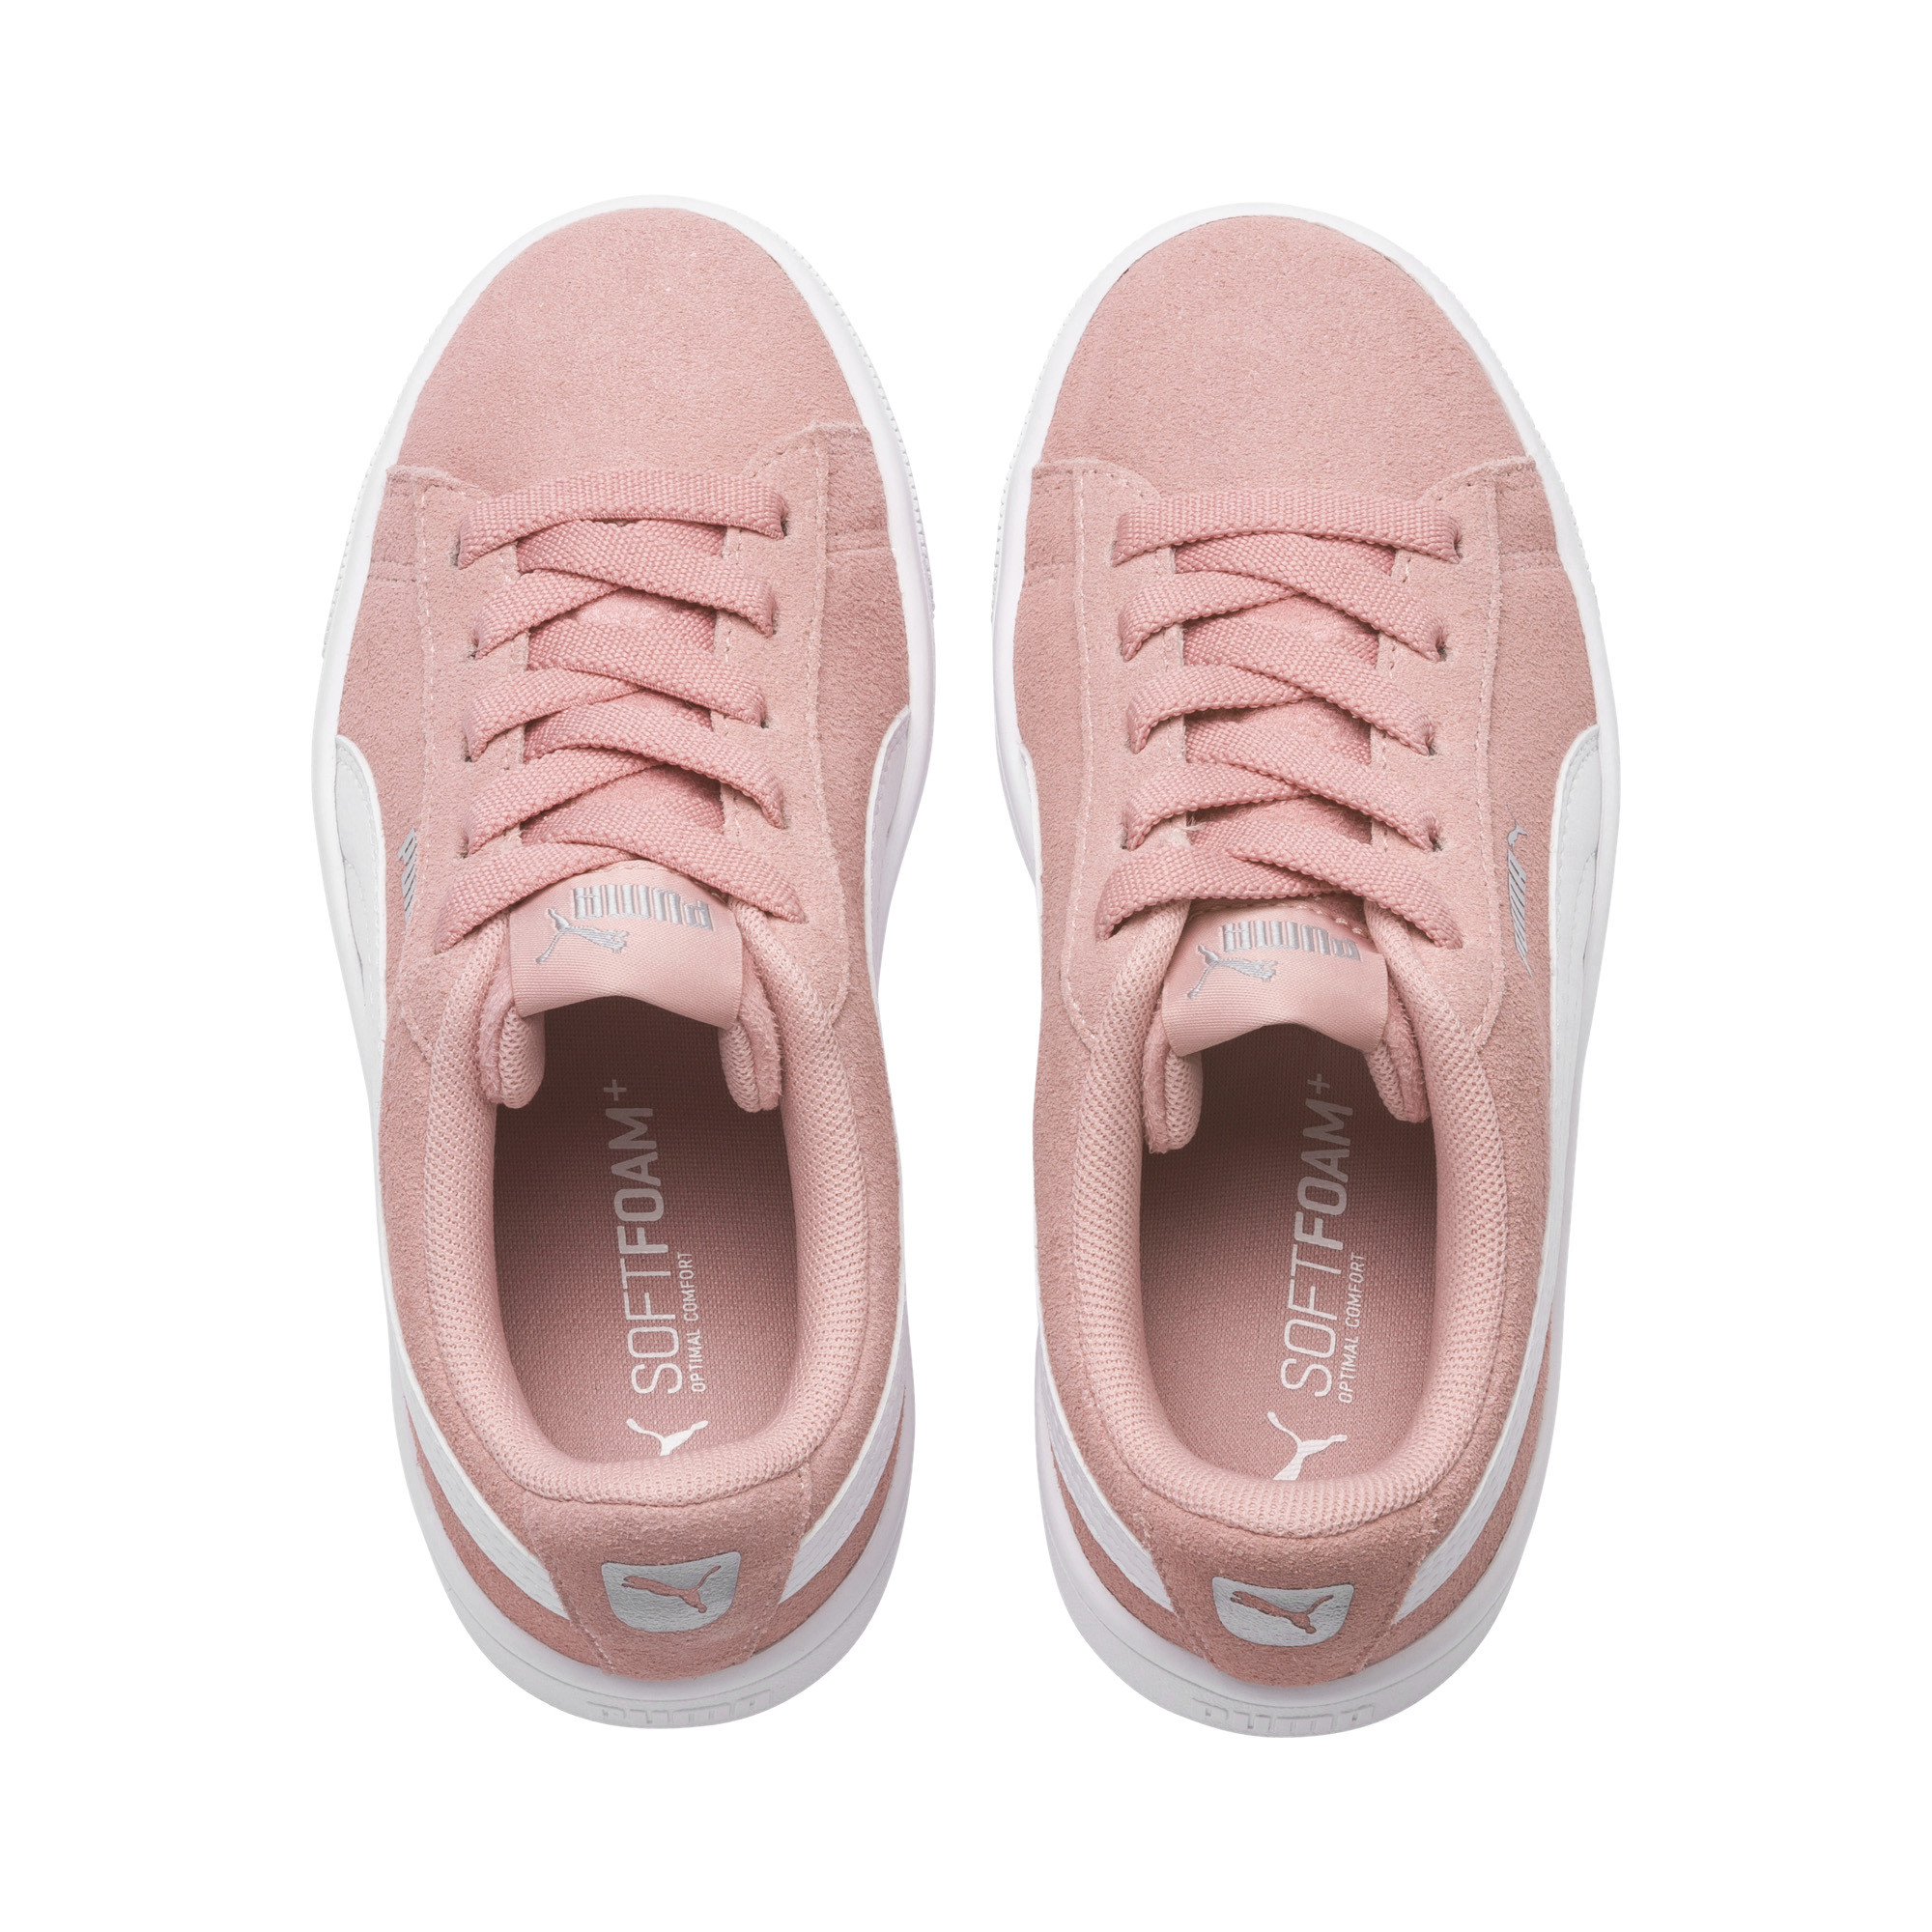 PUMA-PUMA-Vikky-v2-Suede-Little-Kids-039-Shoes-Girls-Shoe-Kids thumbnail 7